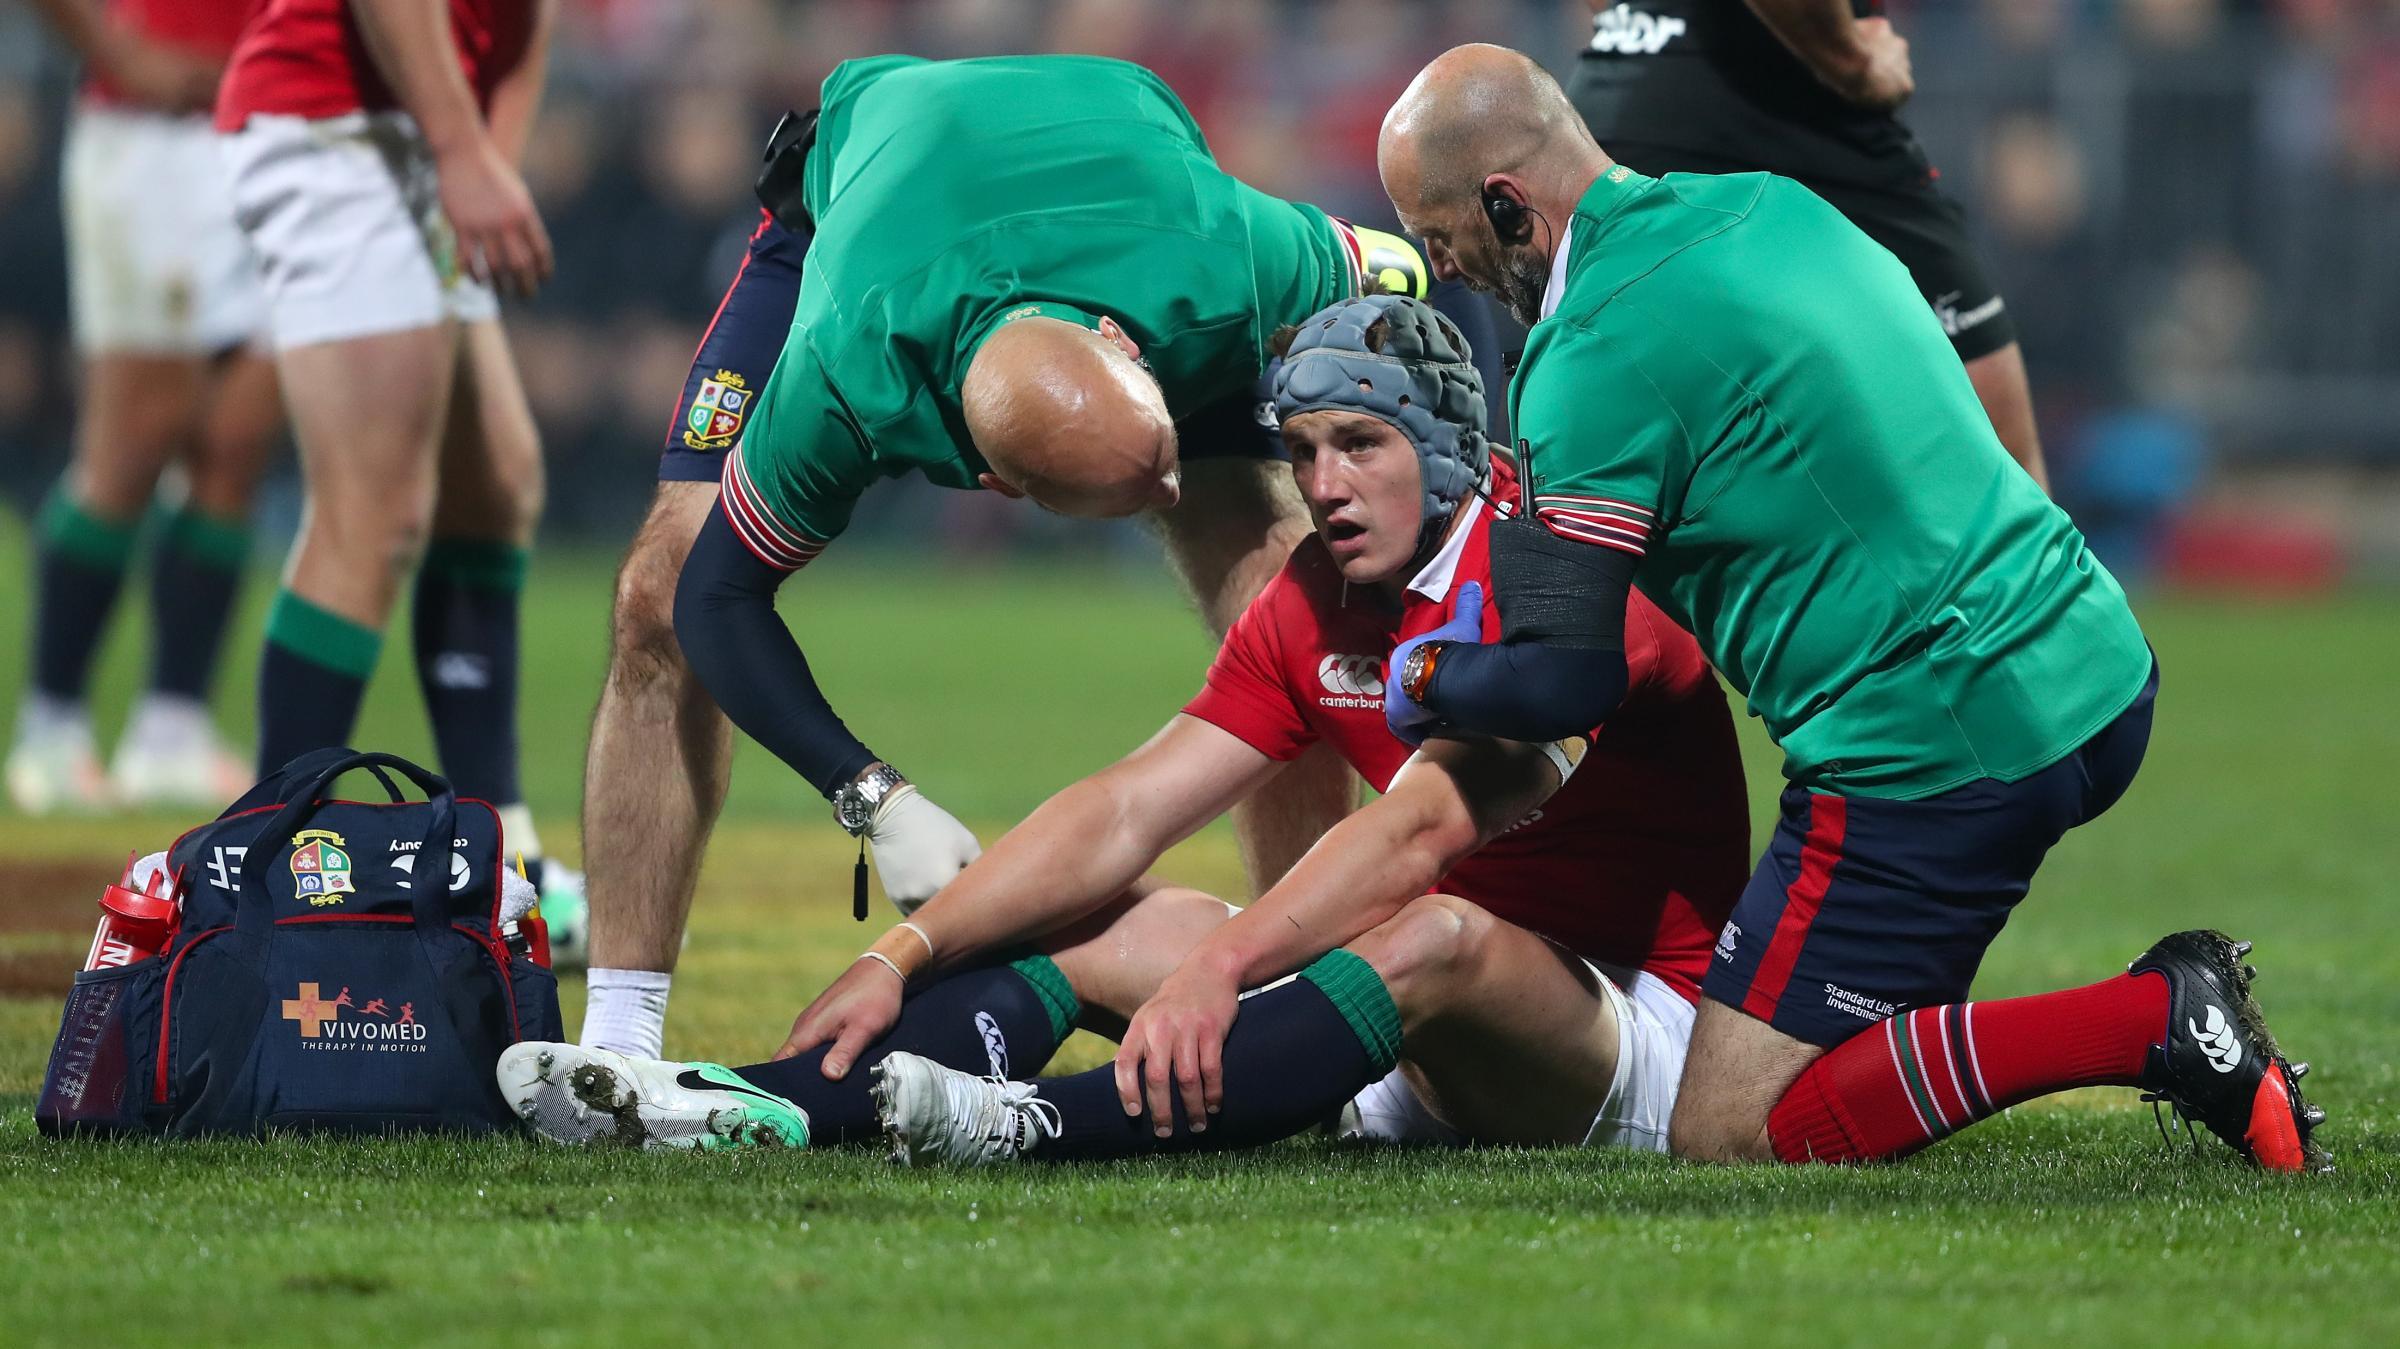 Farrell to sit out Maori All Blacks clash